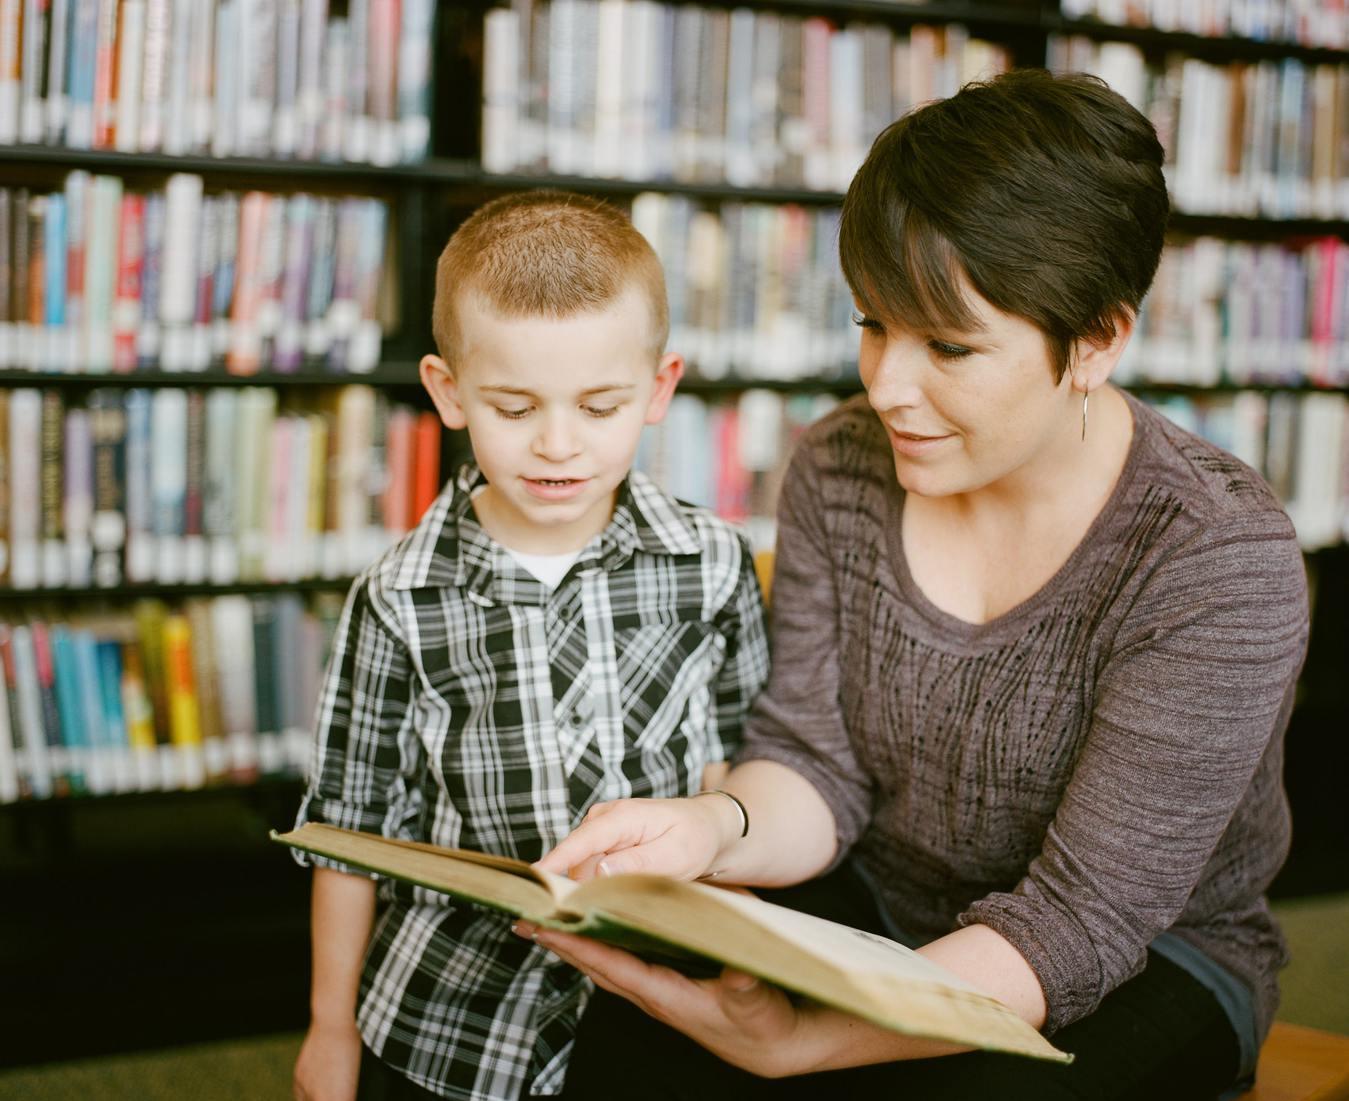 Adulto che insegna a un bambino con un libro